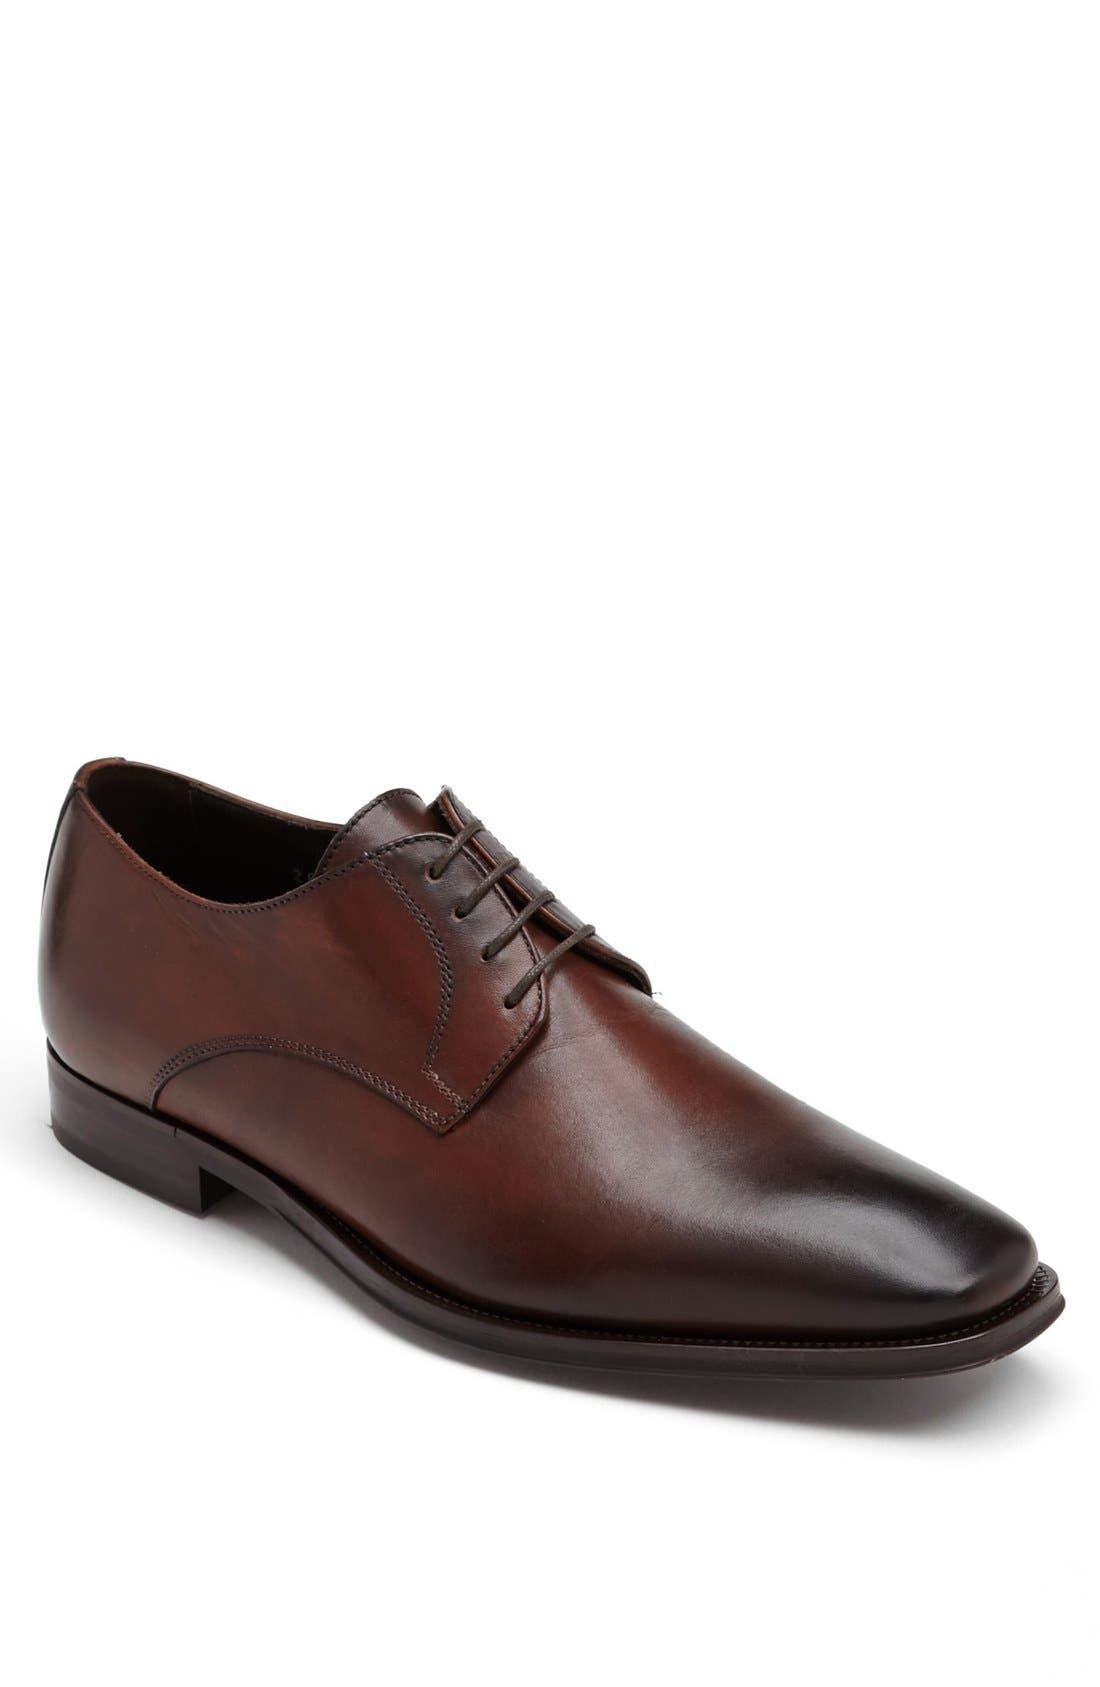 Alternate Image 1 Selected - To Boot New York 'Felix' Plain Toe Derby (Men)